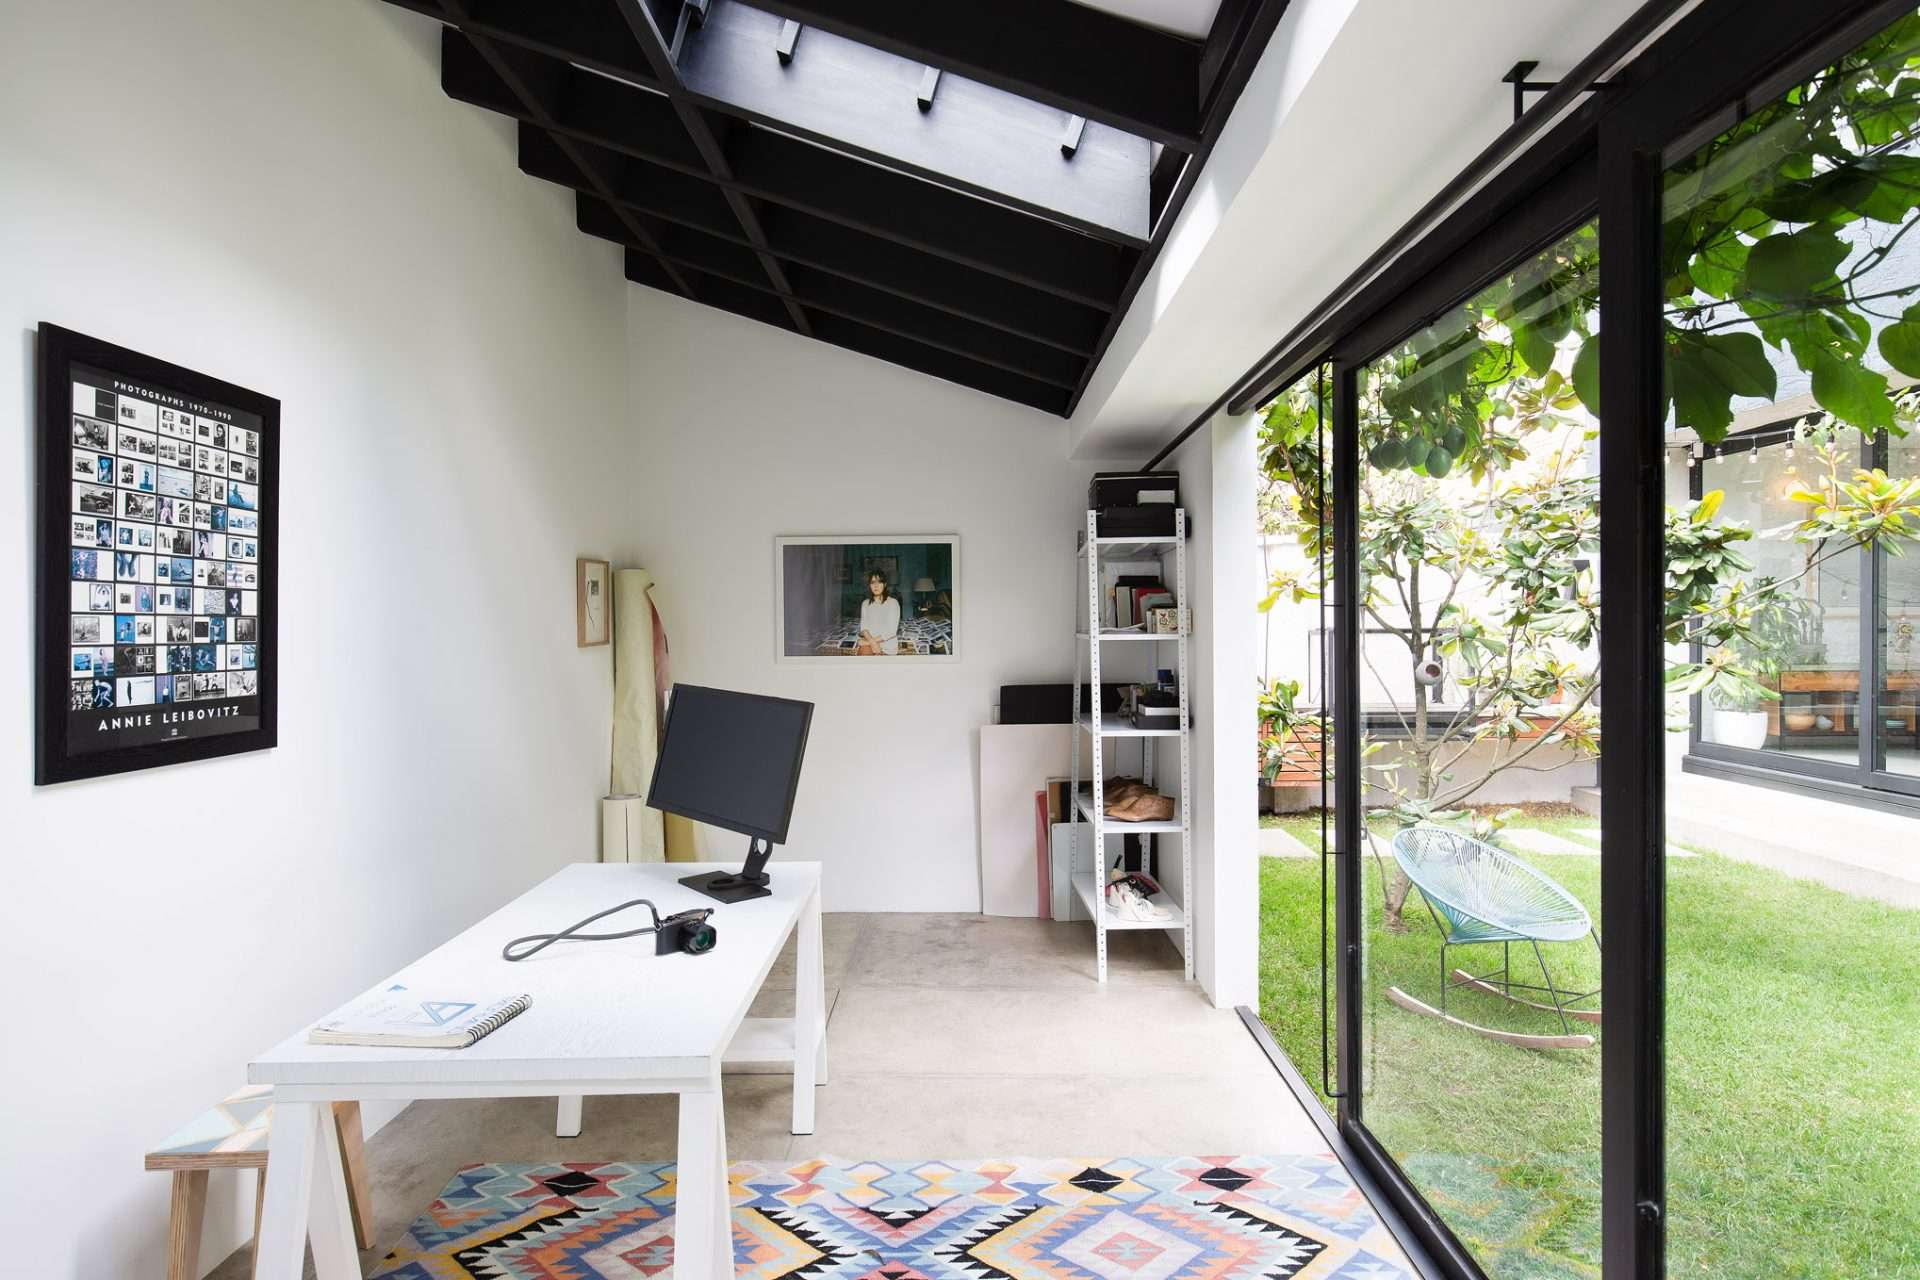 08.oberlaenderarquitectos.arquitectura.simonboschphotography.simon.bosch.bogota.interior.habitar